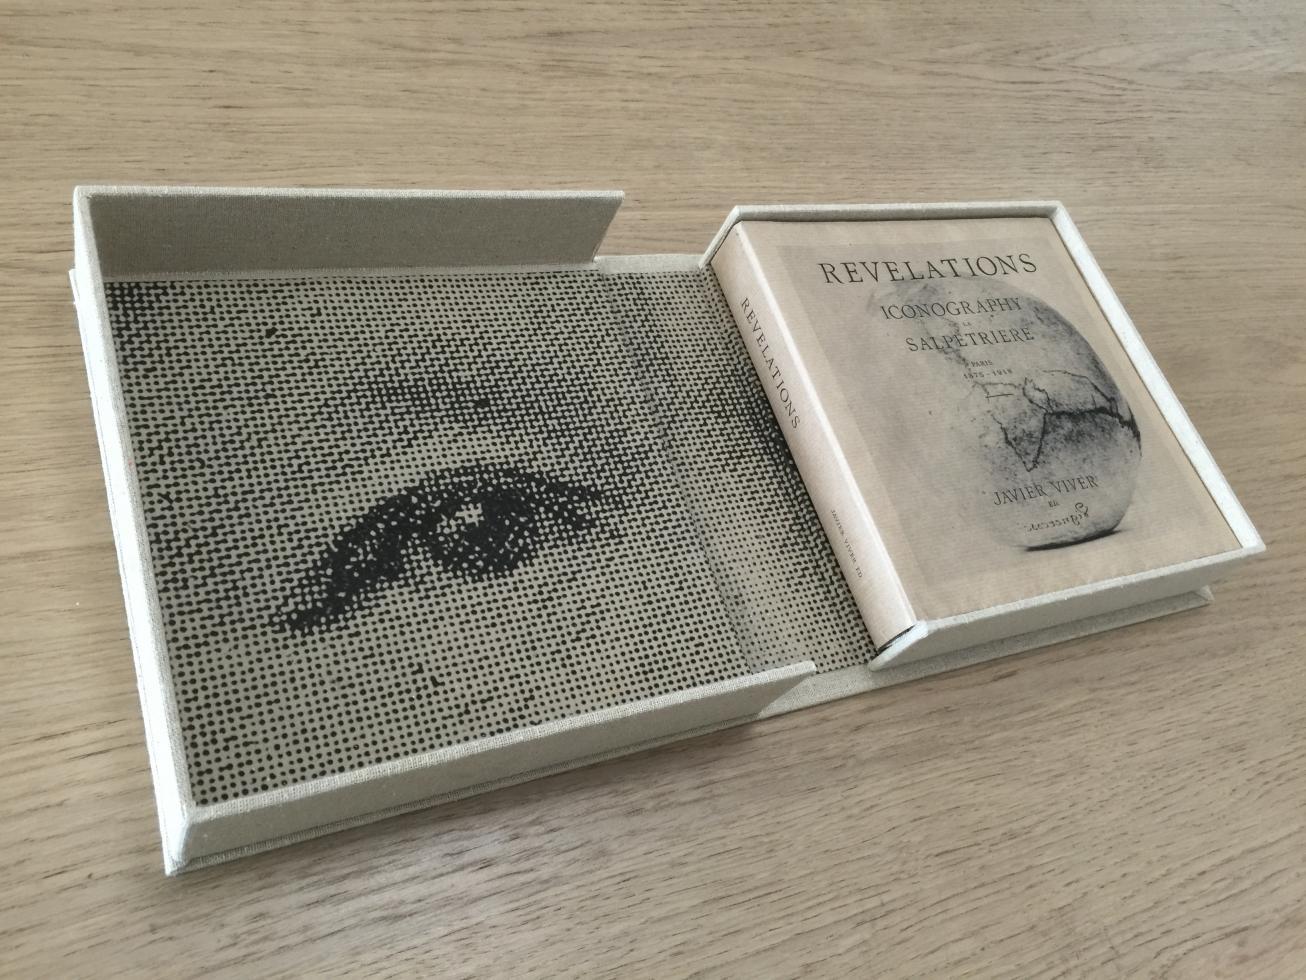 Révélations. Iconographie de la Salpetriere. Edición en caja. (2014) - Javier Viver